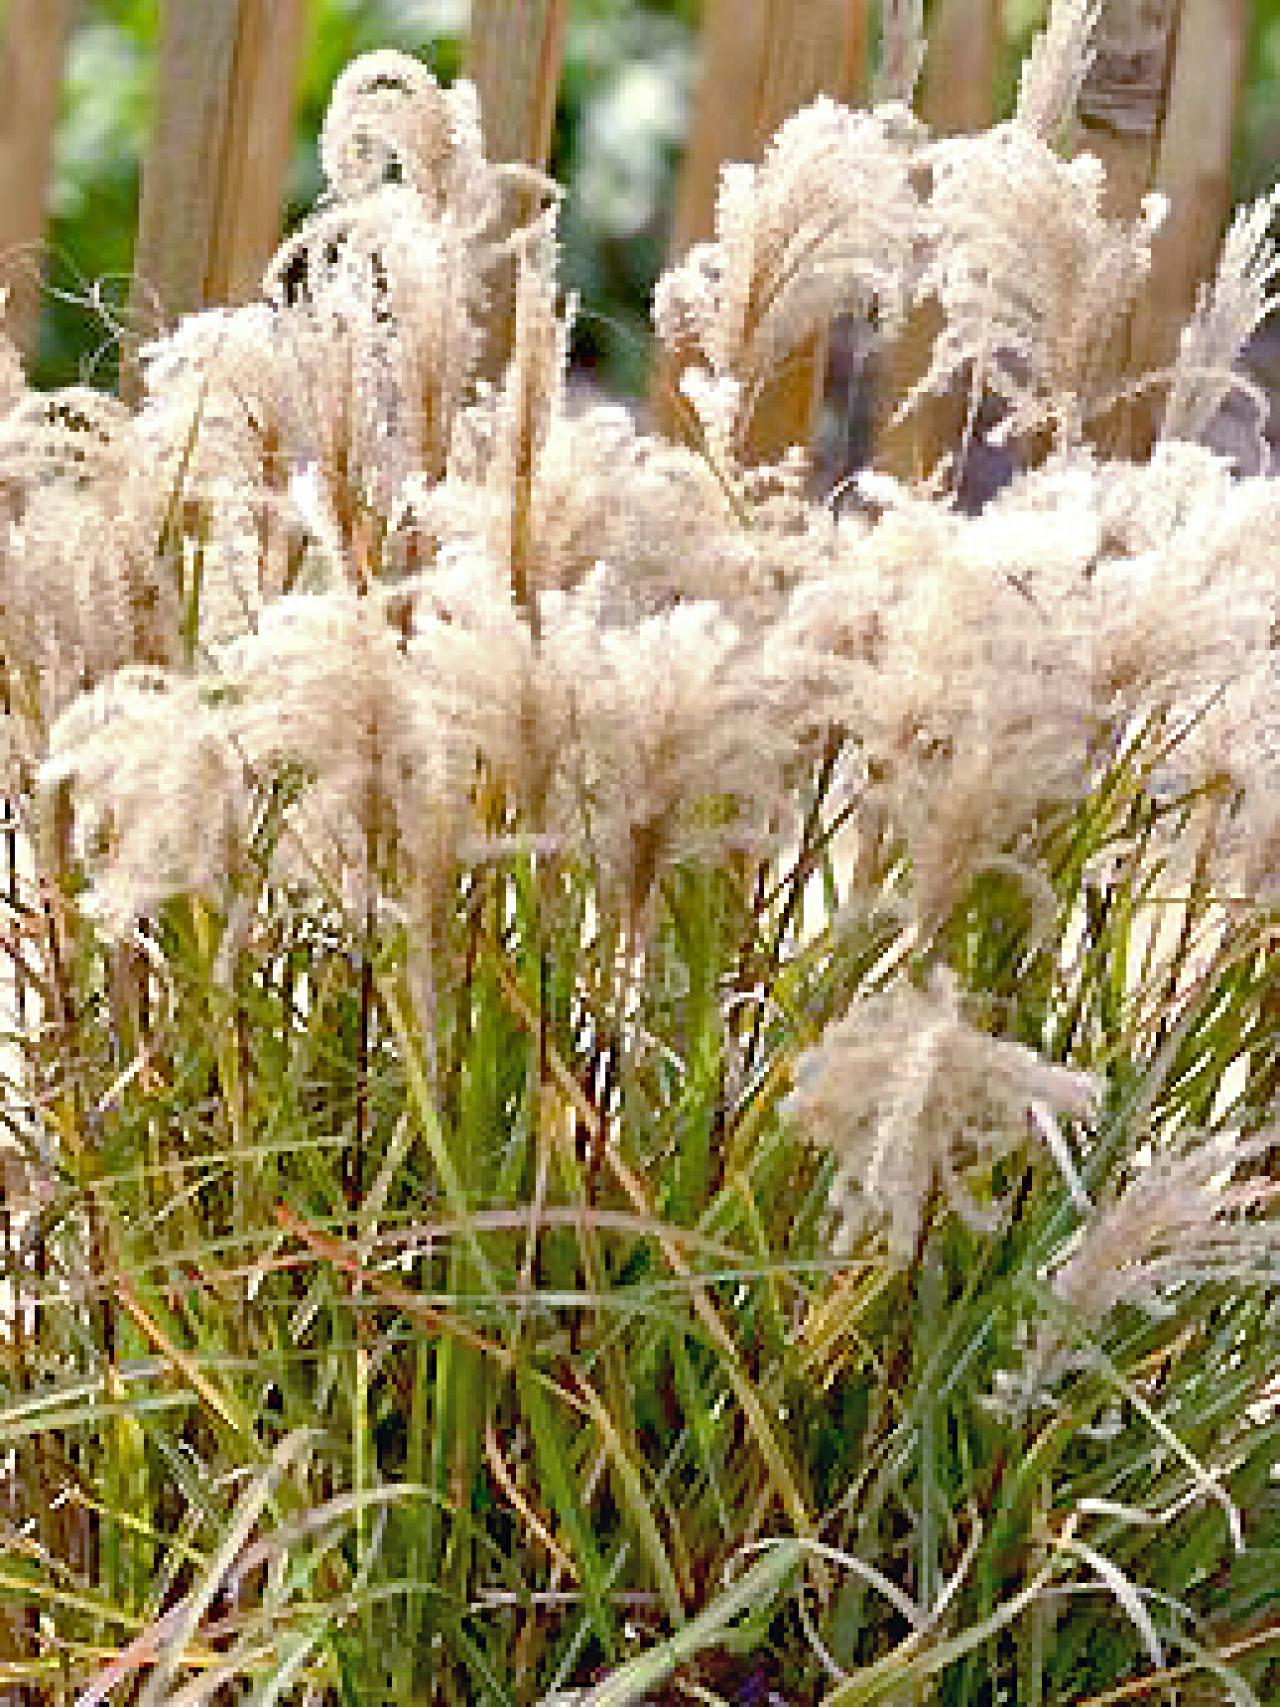 Types of ornamental grasses hgtv for Ornamental grass ideas